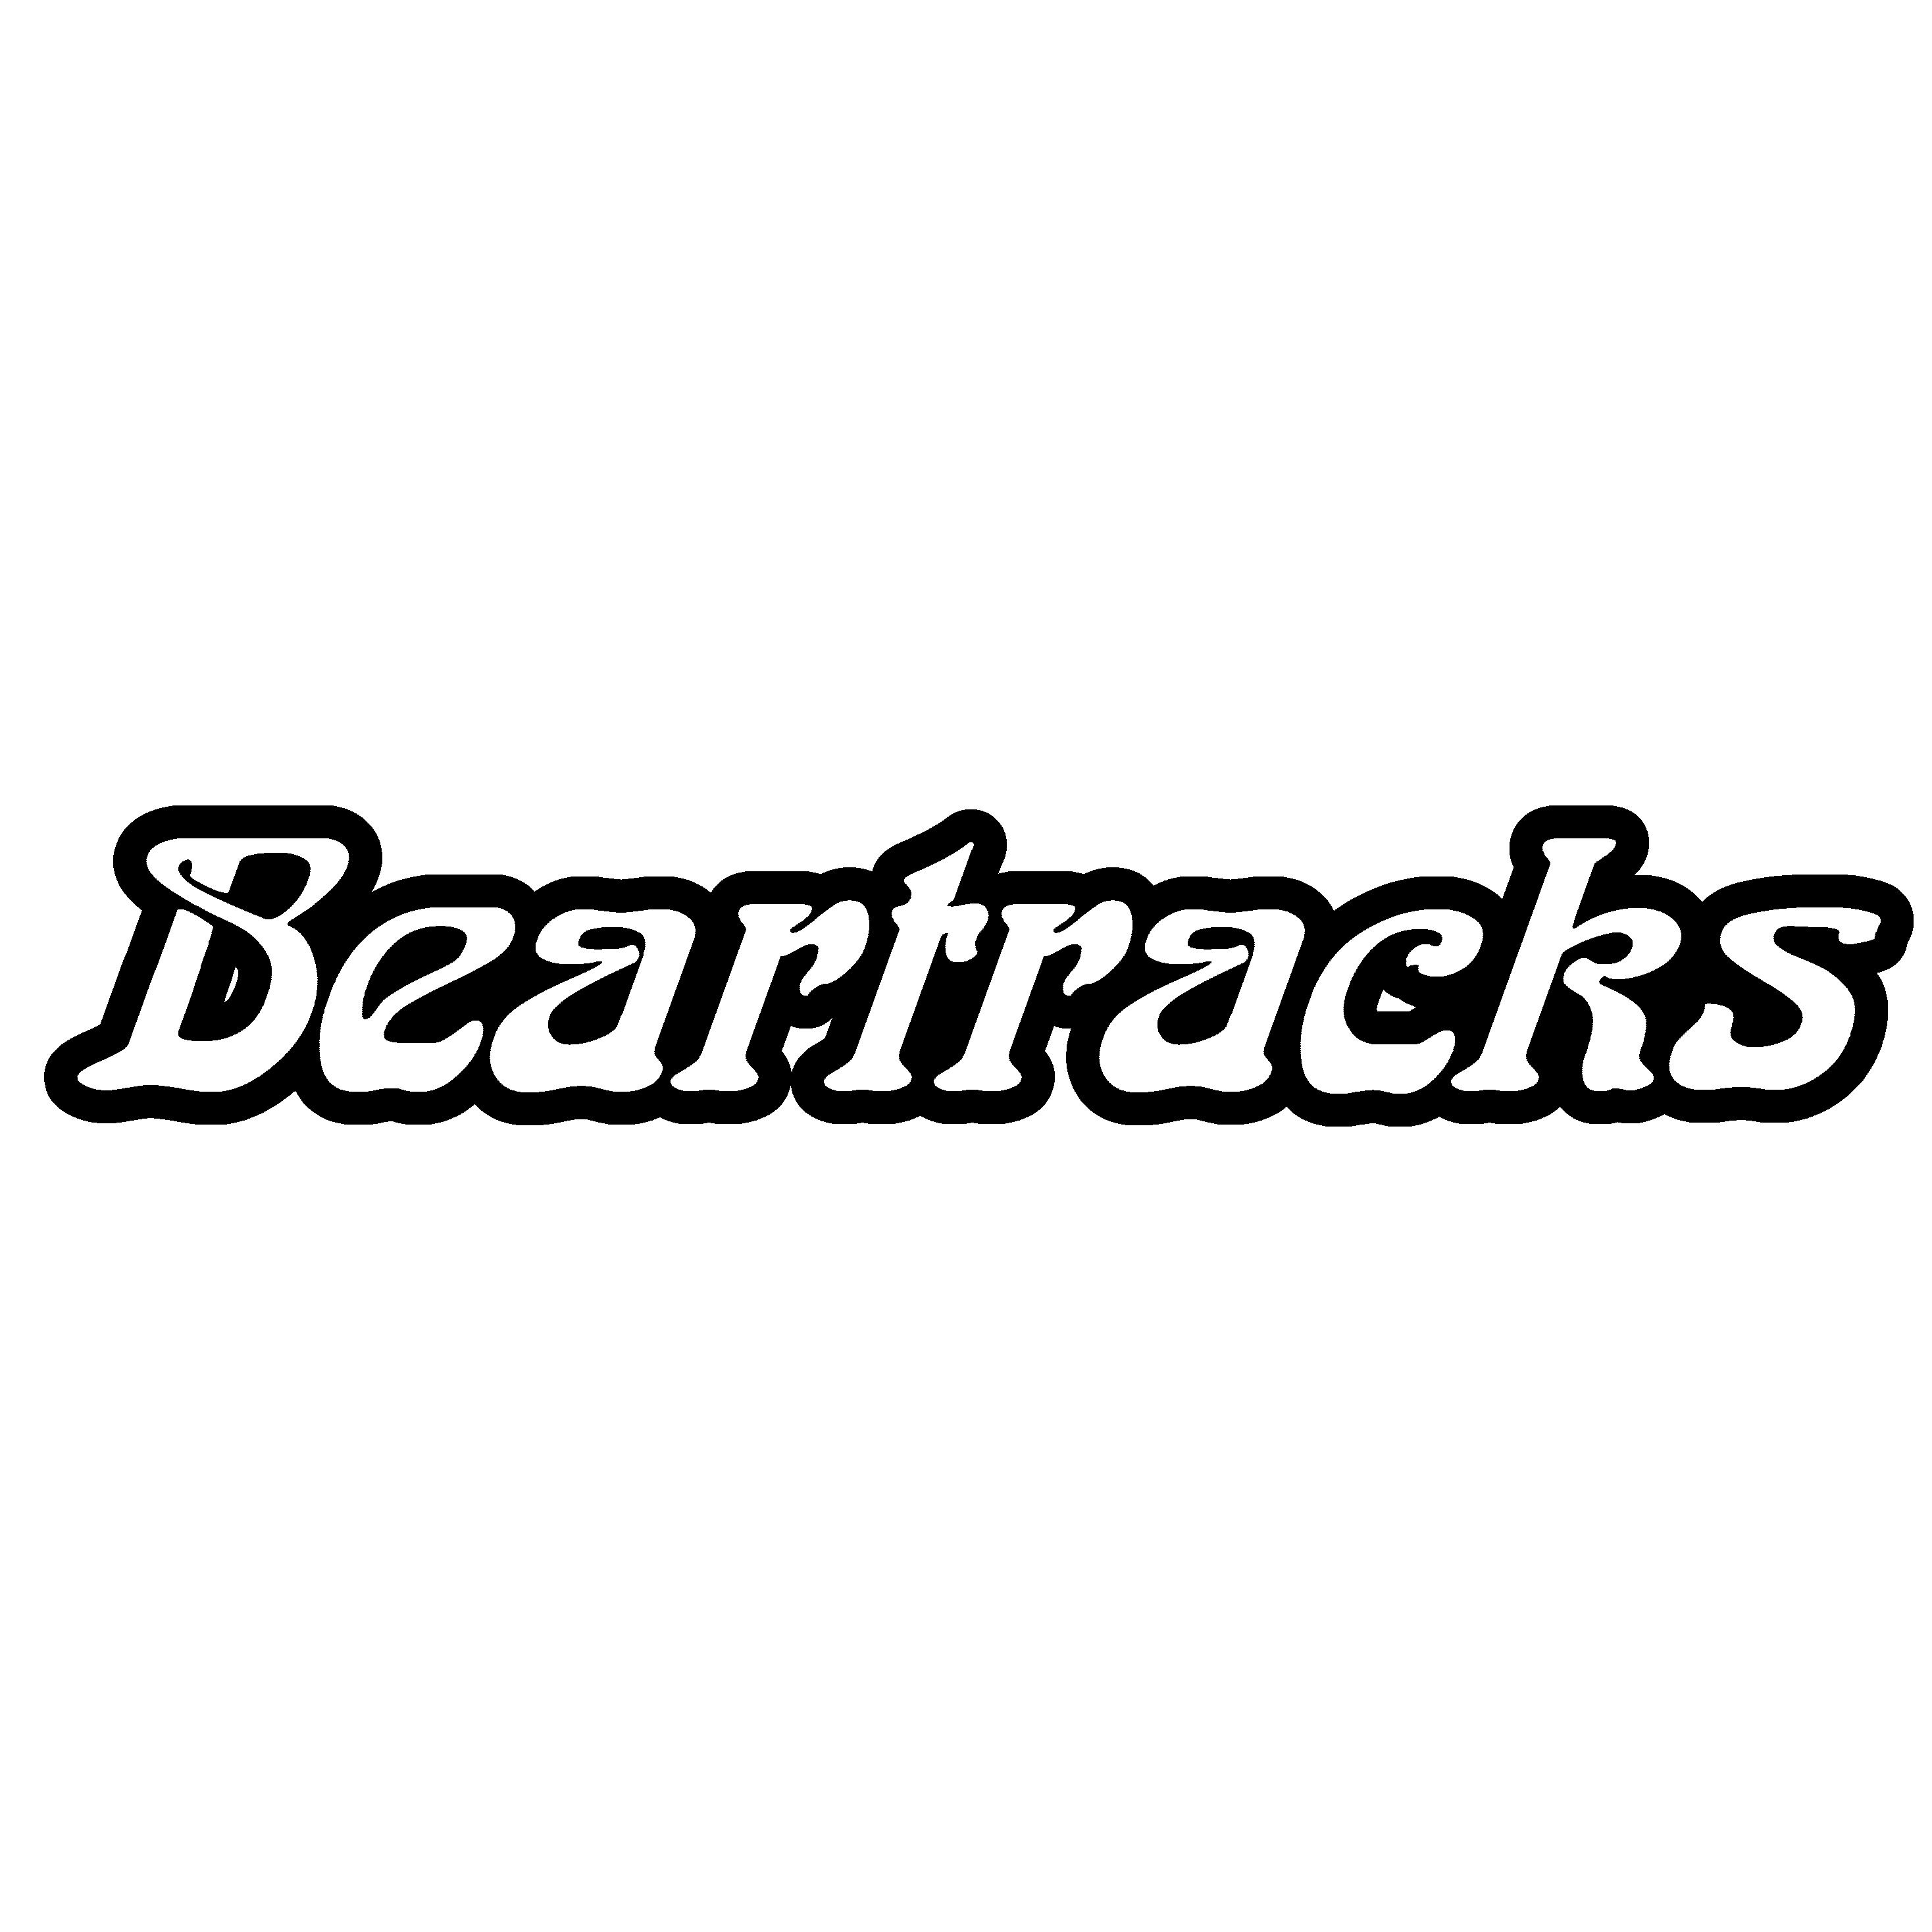 Beartracks